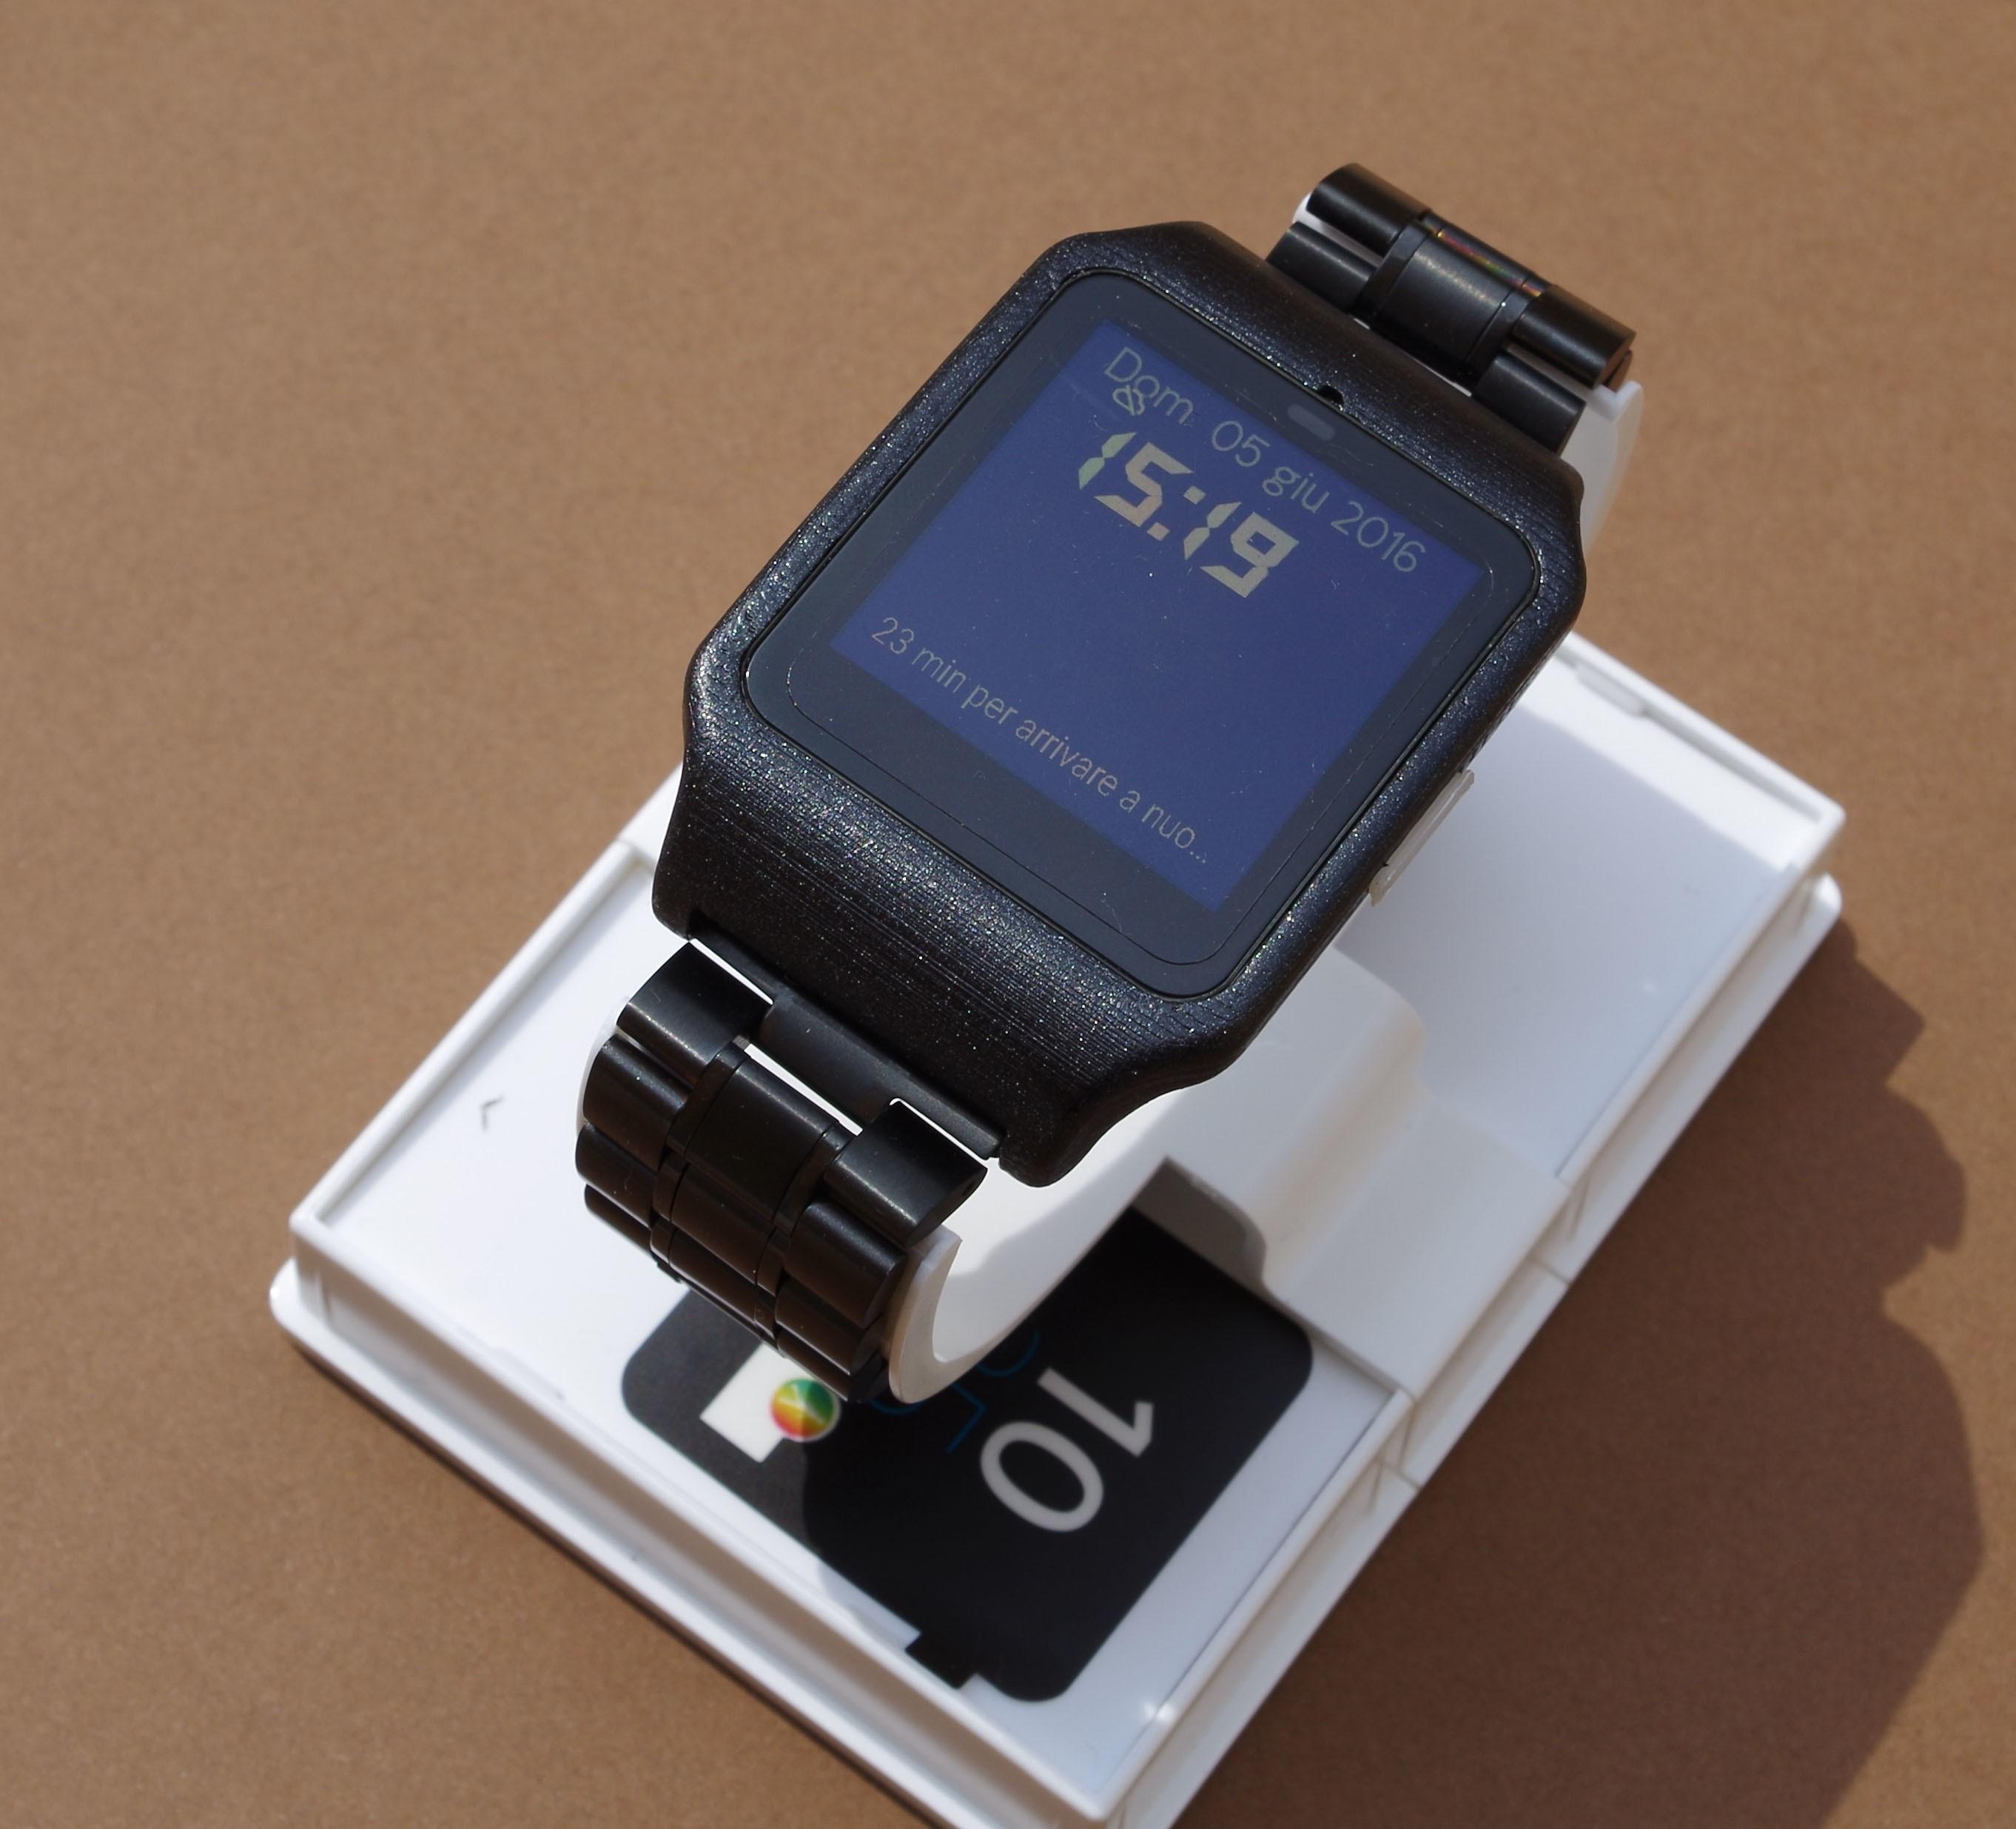 IMGP6245.JPG Download STL file sony smartwatch 3 holder • 3D printable design, MZTutto3D